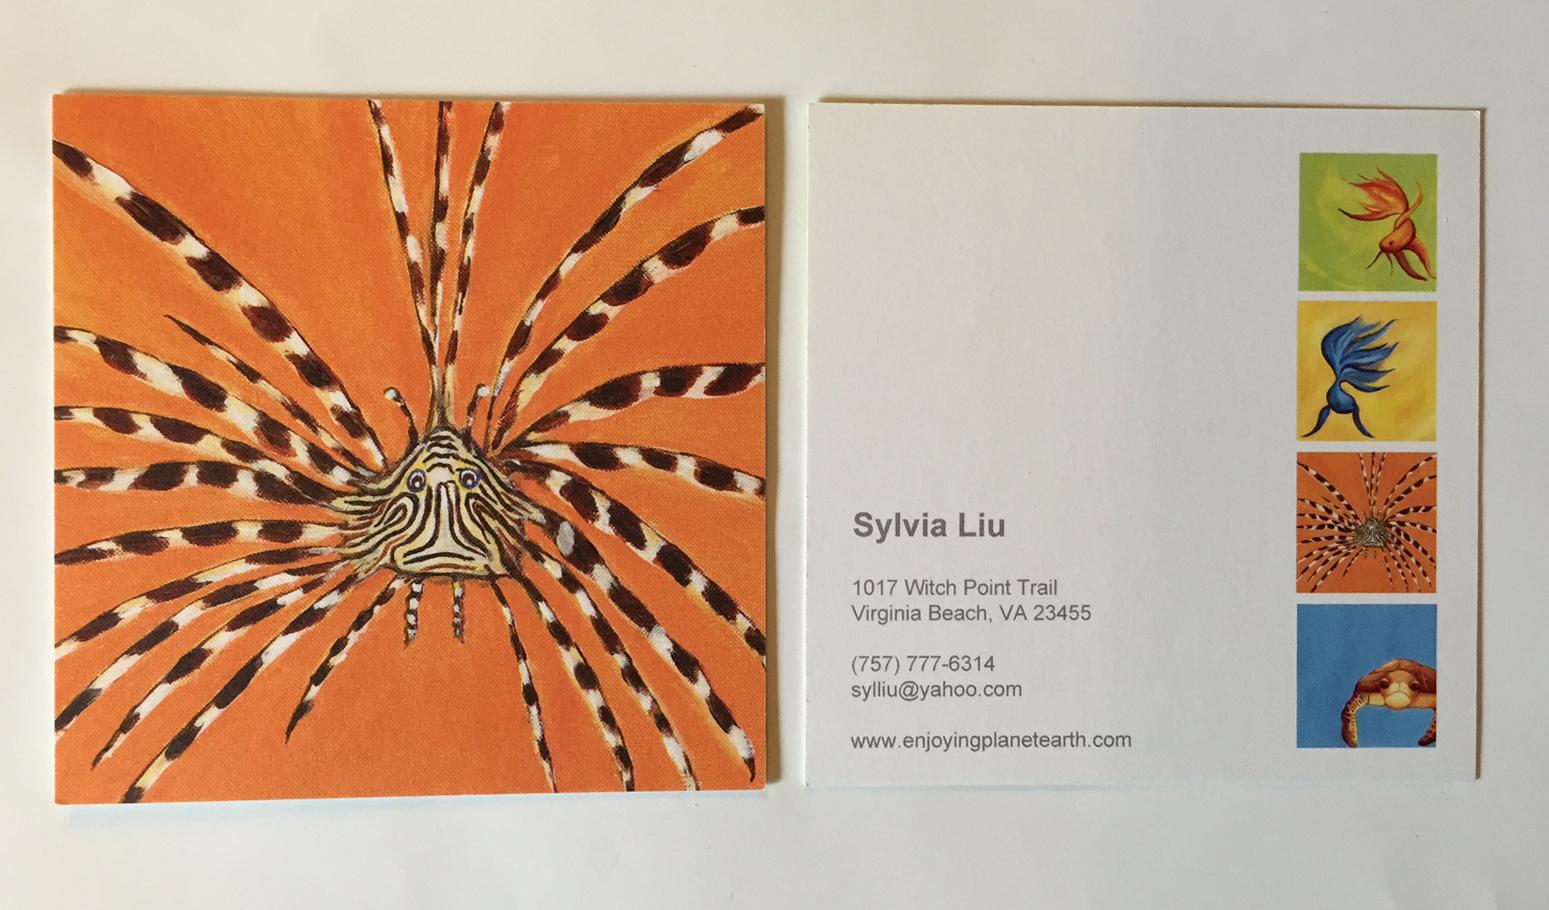 sylvia liu land postcard and business card printers